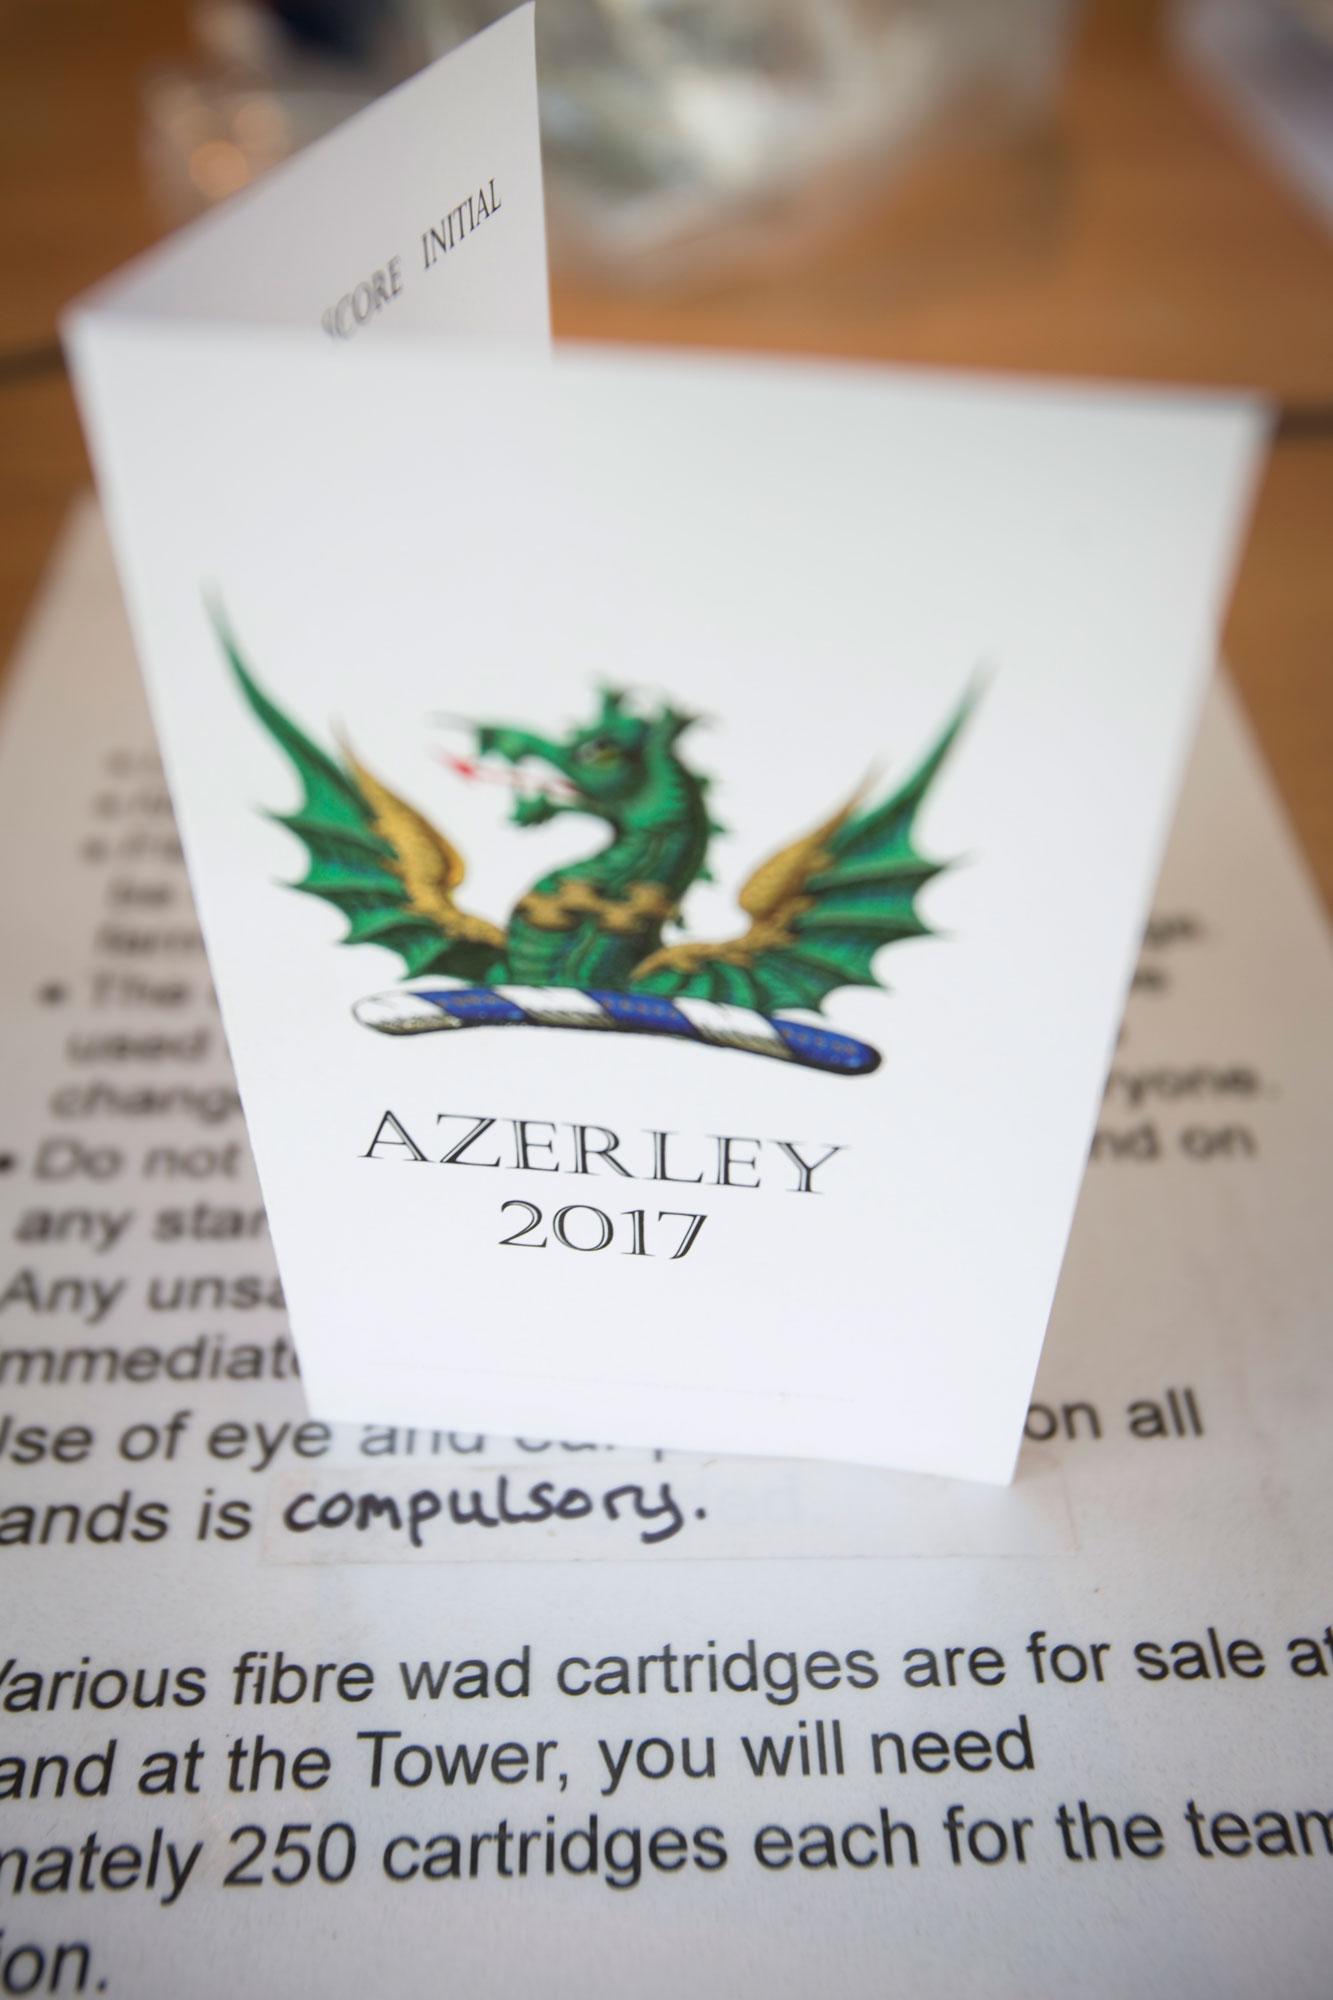 001Azerley-Clay-Shoot-23rd-April-2017.jpg